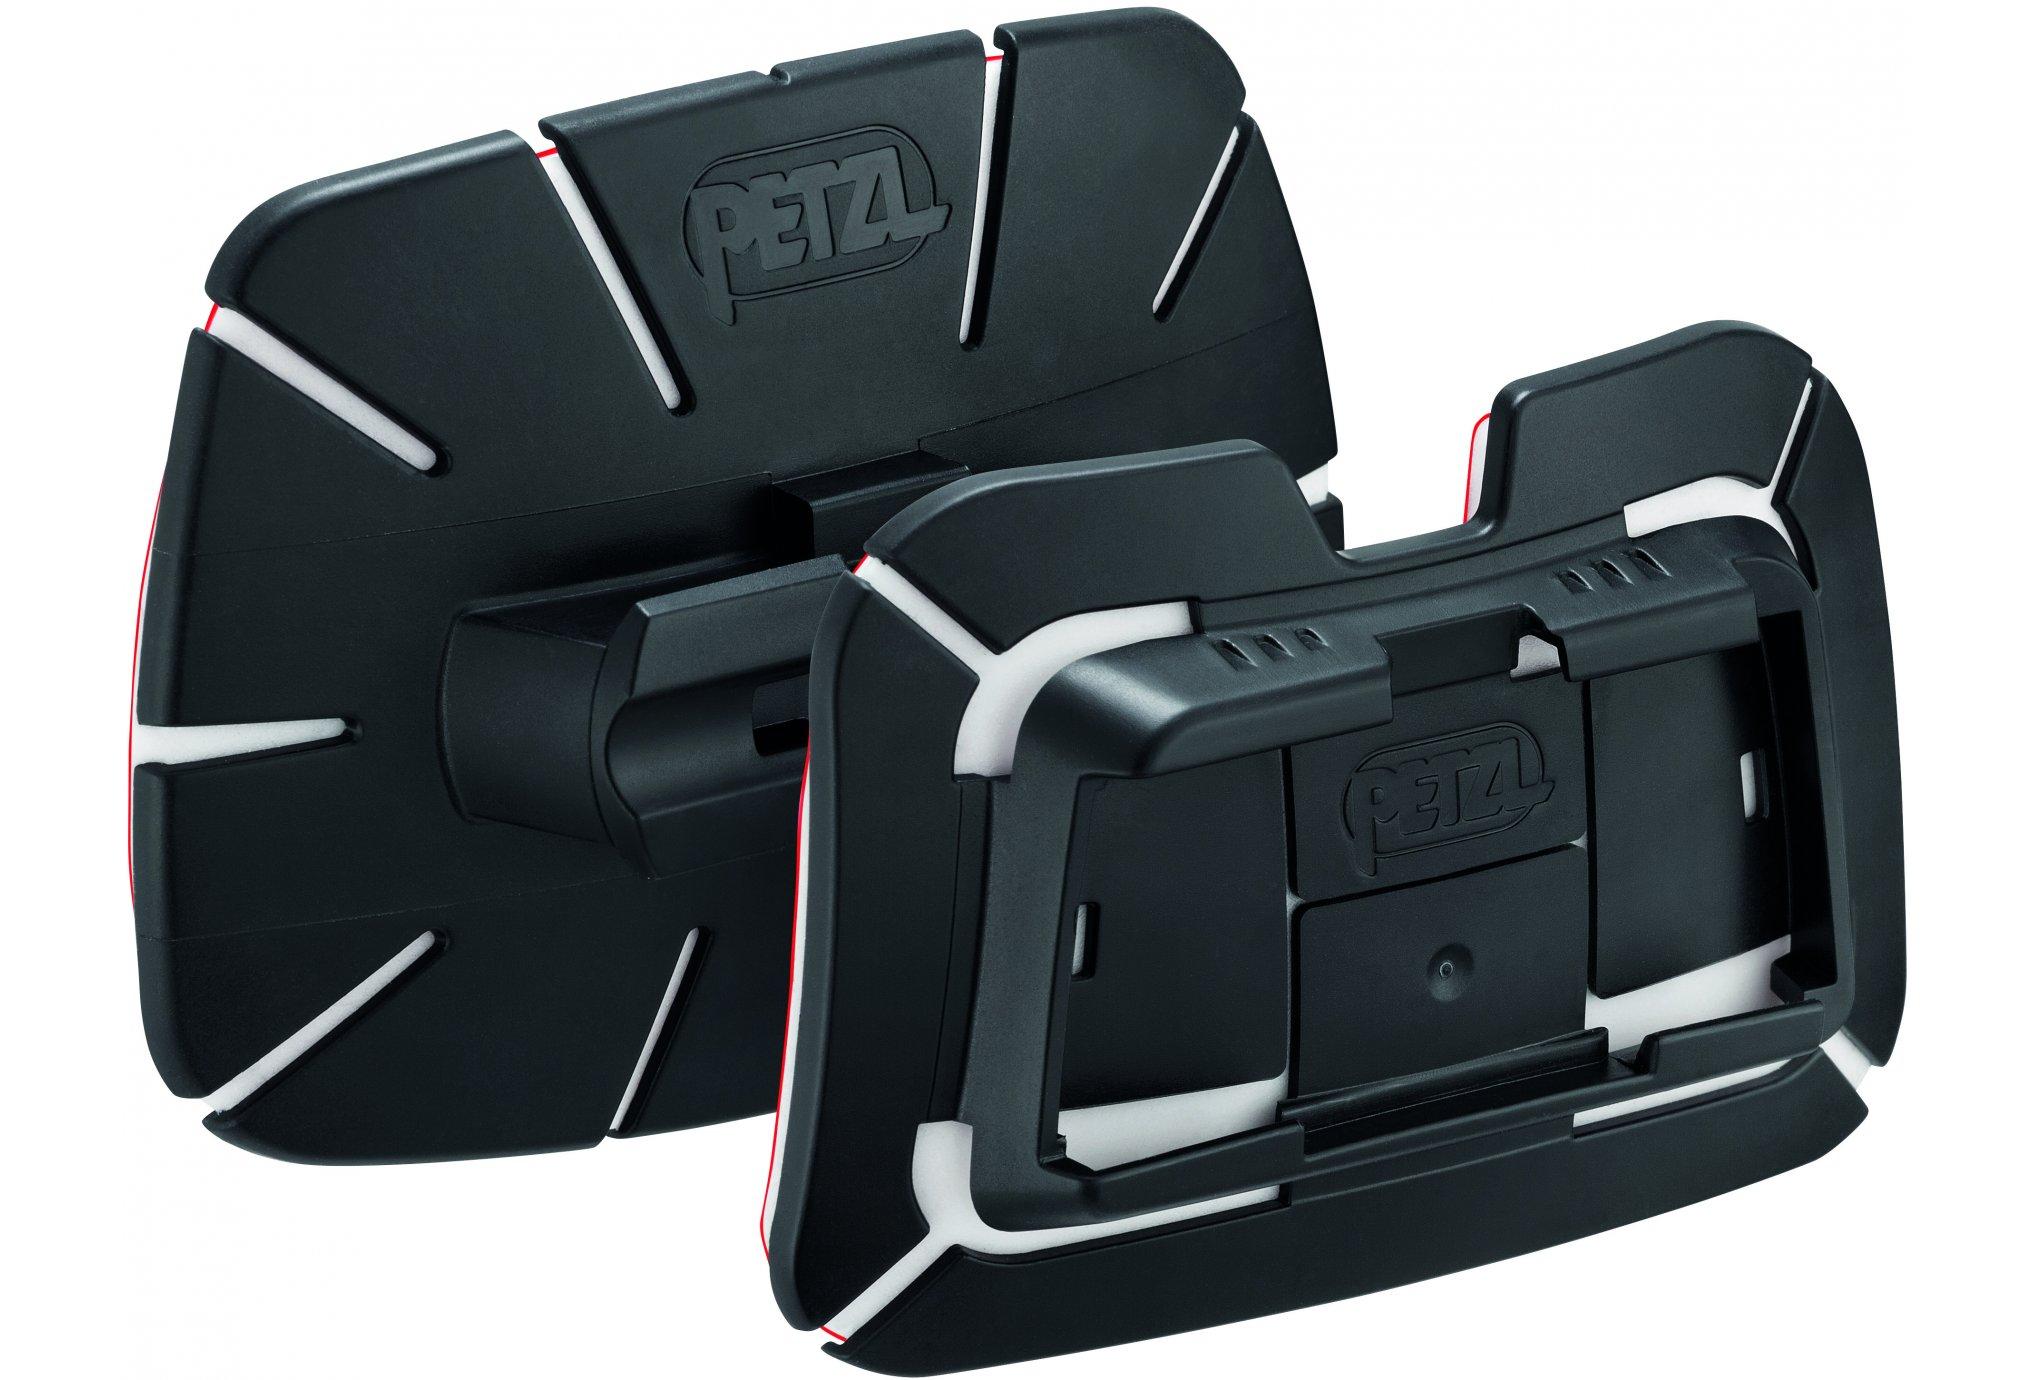 Petzl Fixation Pro Adapt Duo Lampe frontale / éclairage